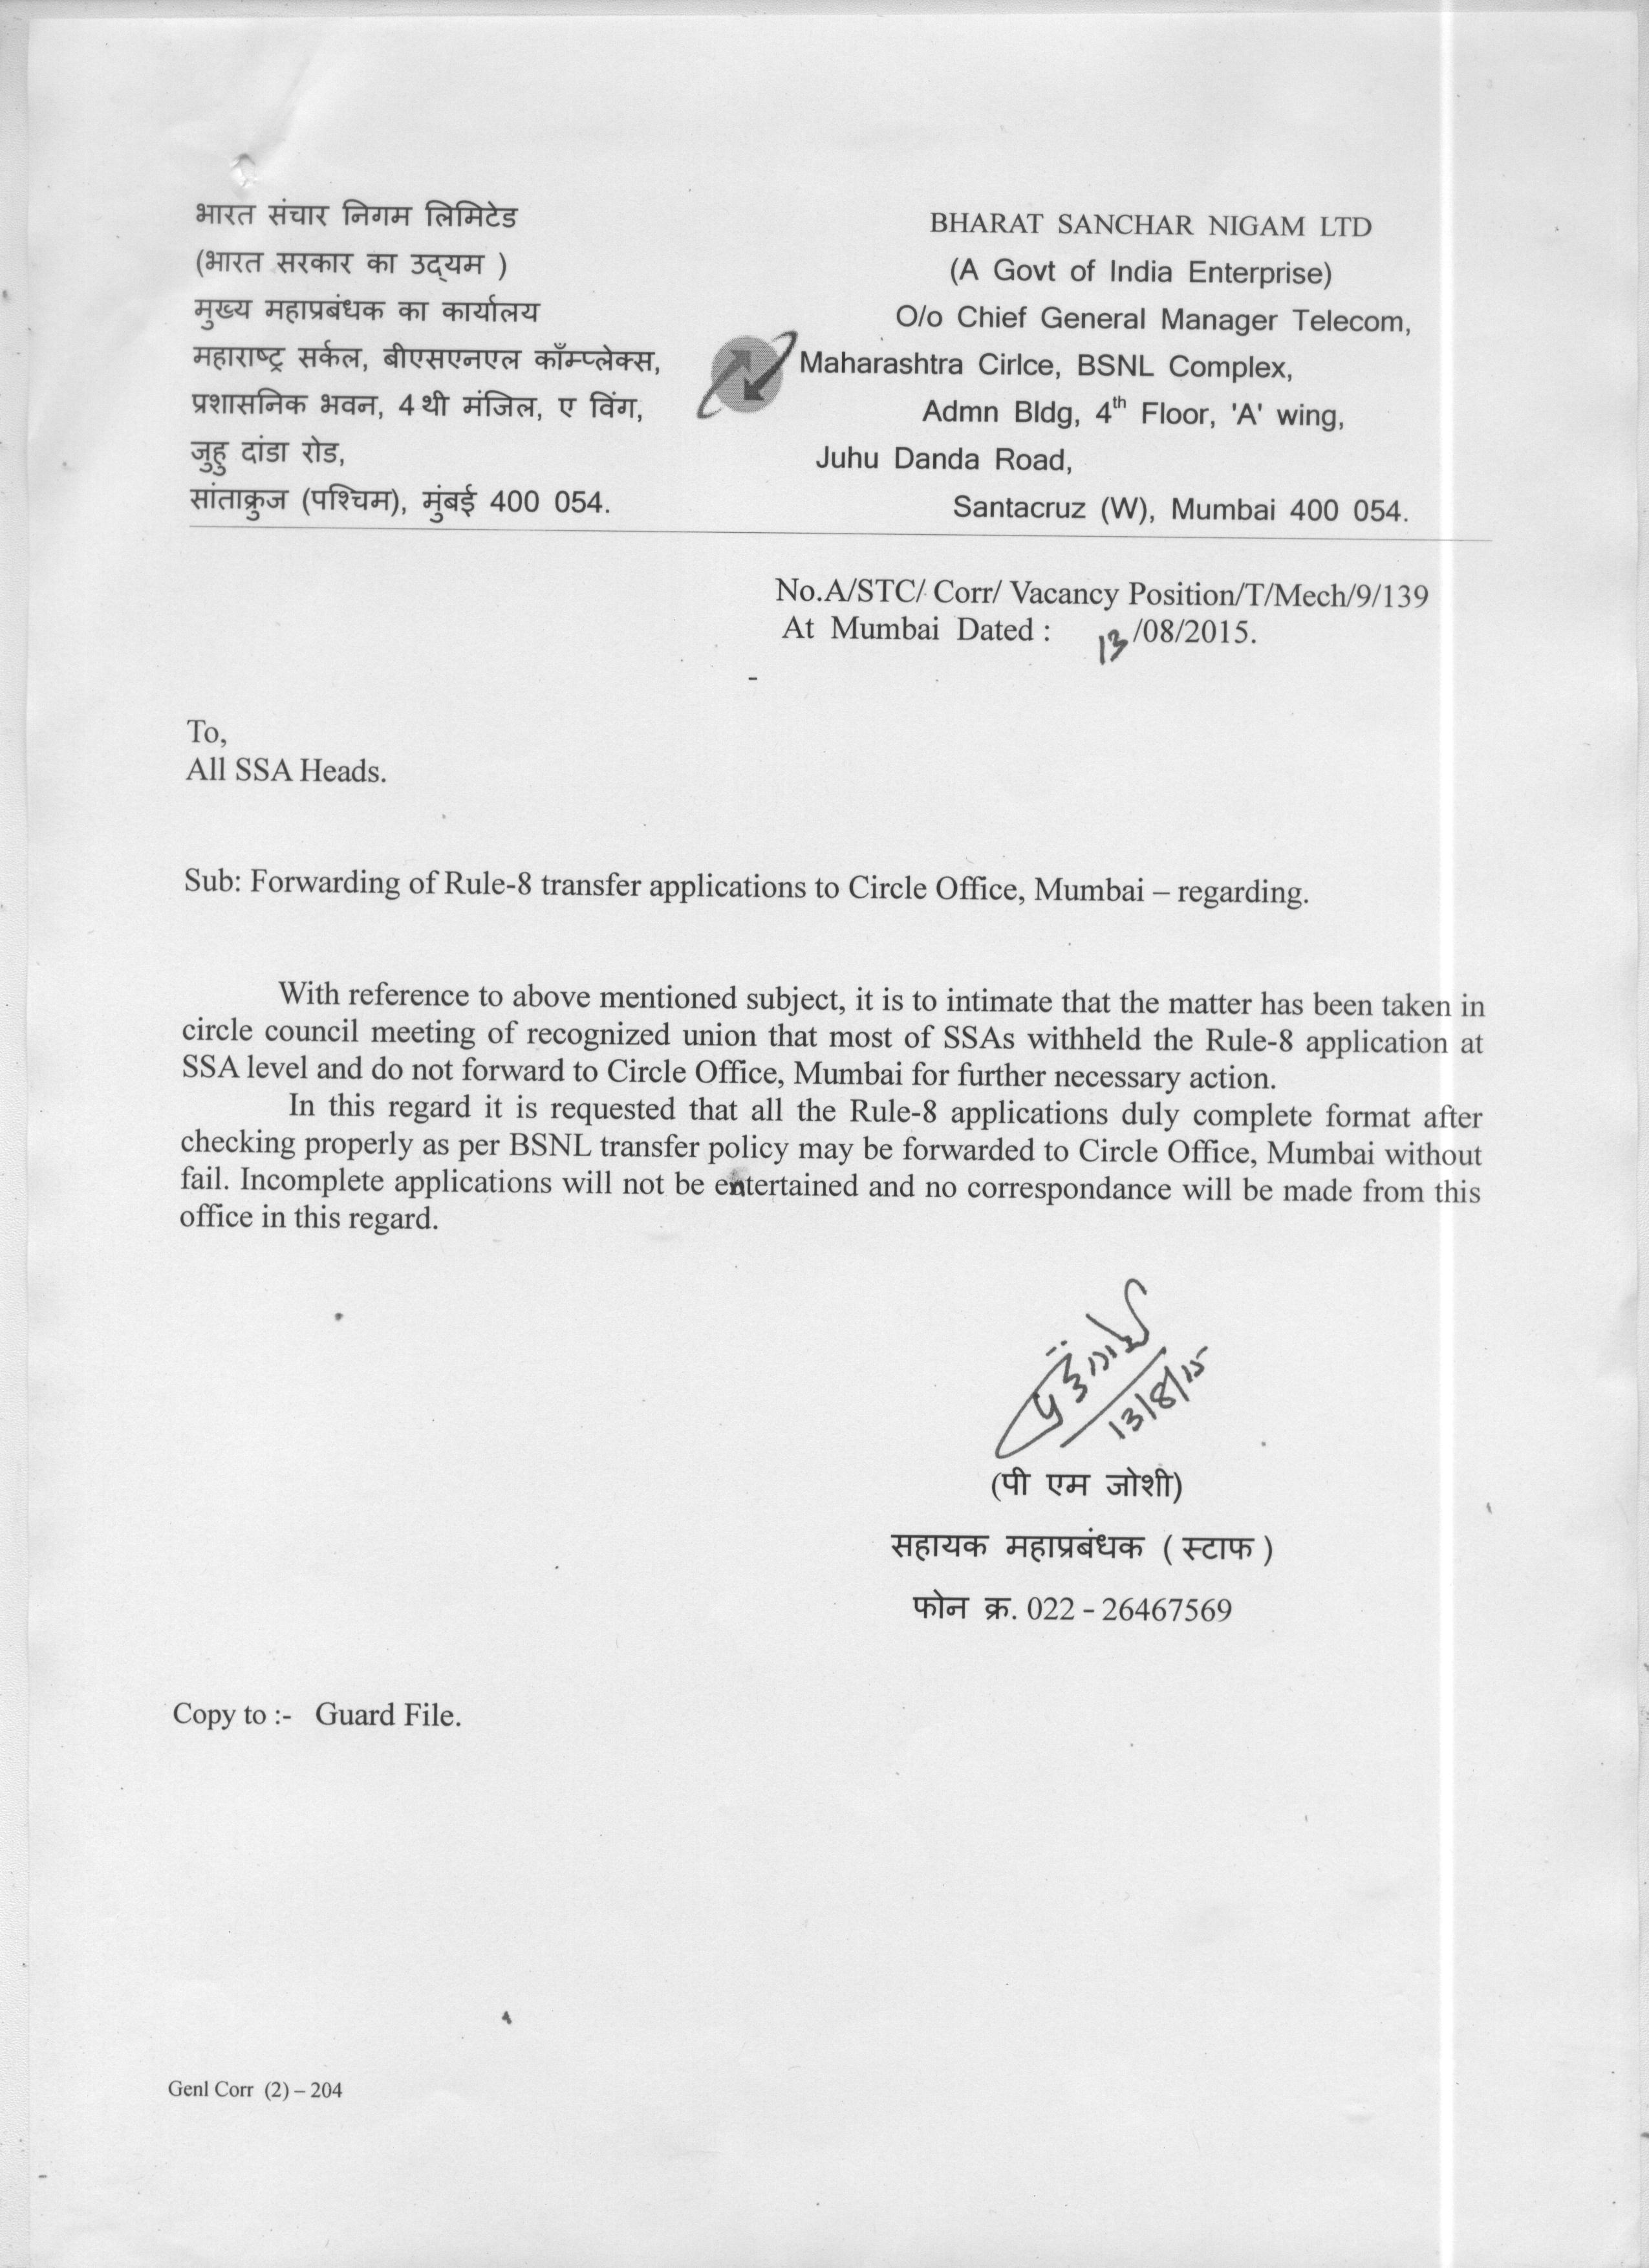 Complaint Letter Format To Mtnl.  Request Letter Format Duplicate Sim Card National Federation Of Telecom Employees request letter format duplicate sim card 28 images